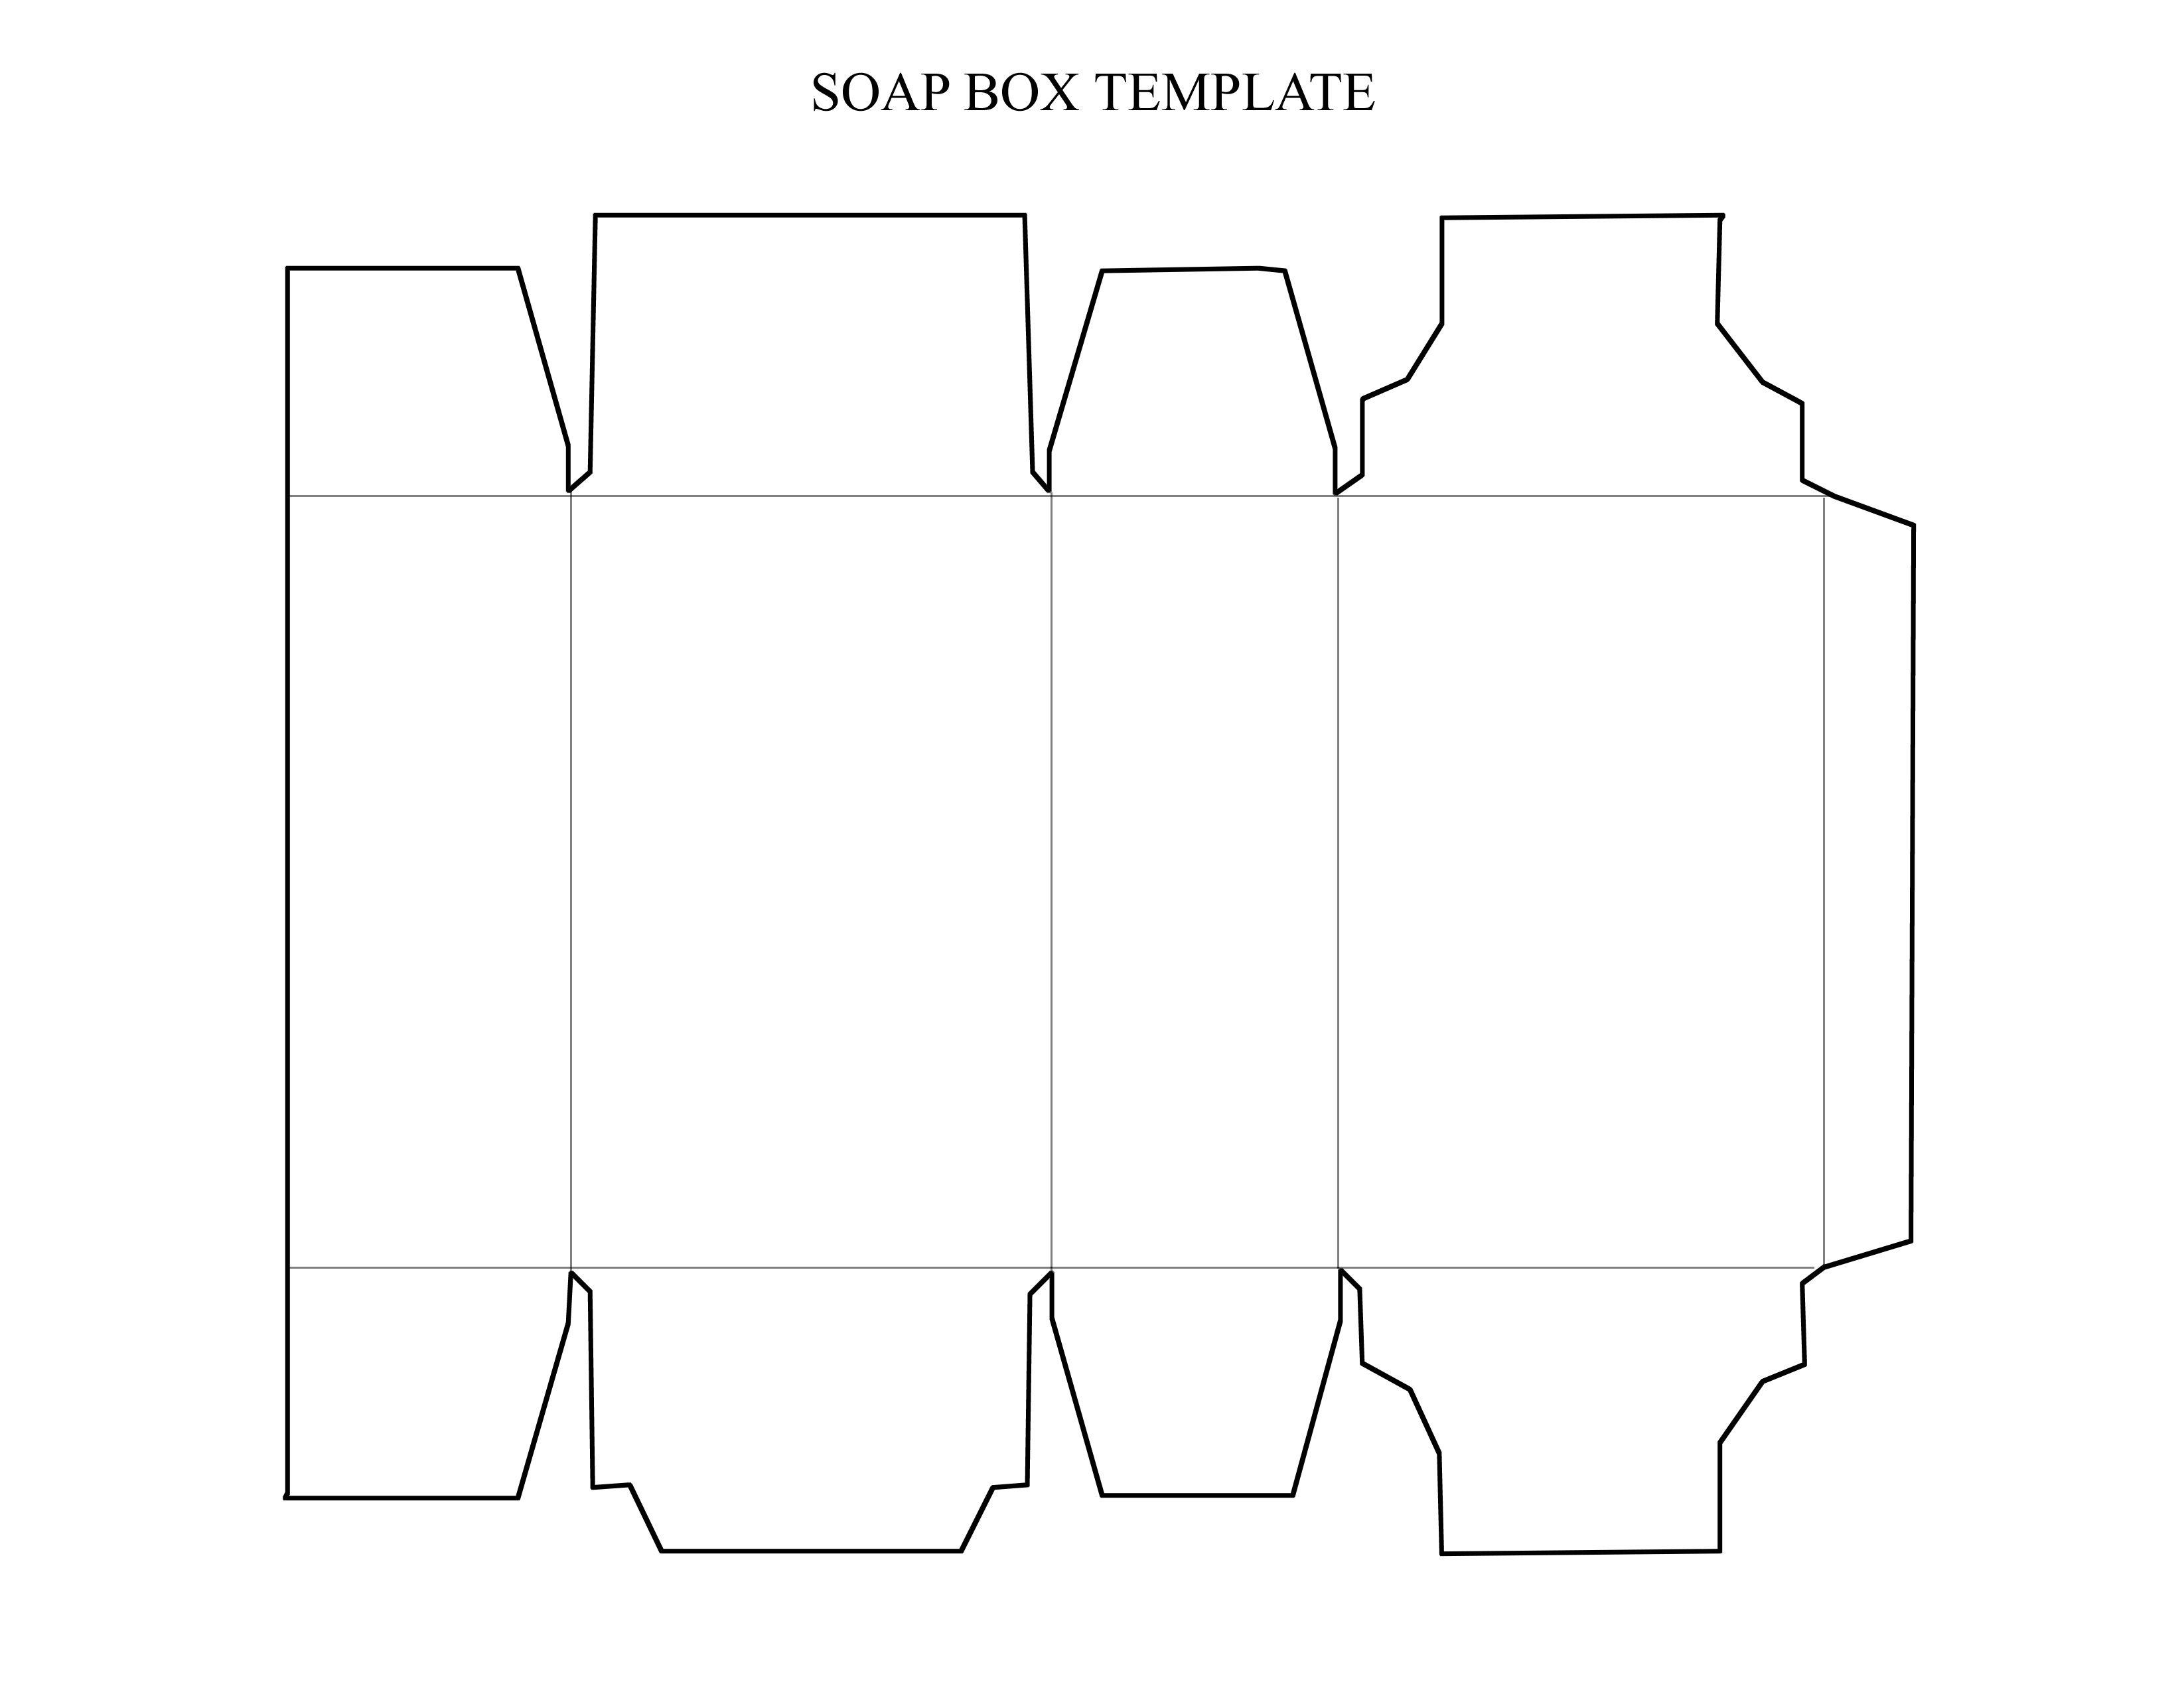 mel stampz 100 box templates tutorials gift card. Black Bedroom Furniture Sets. Home Design Ideas